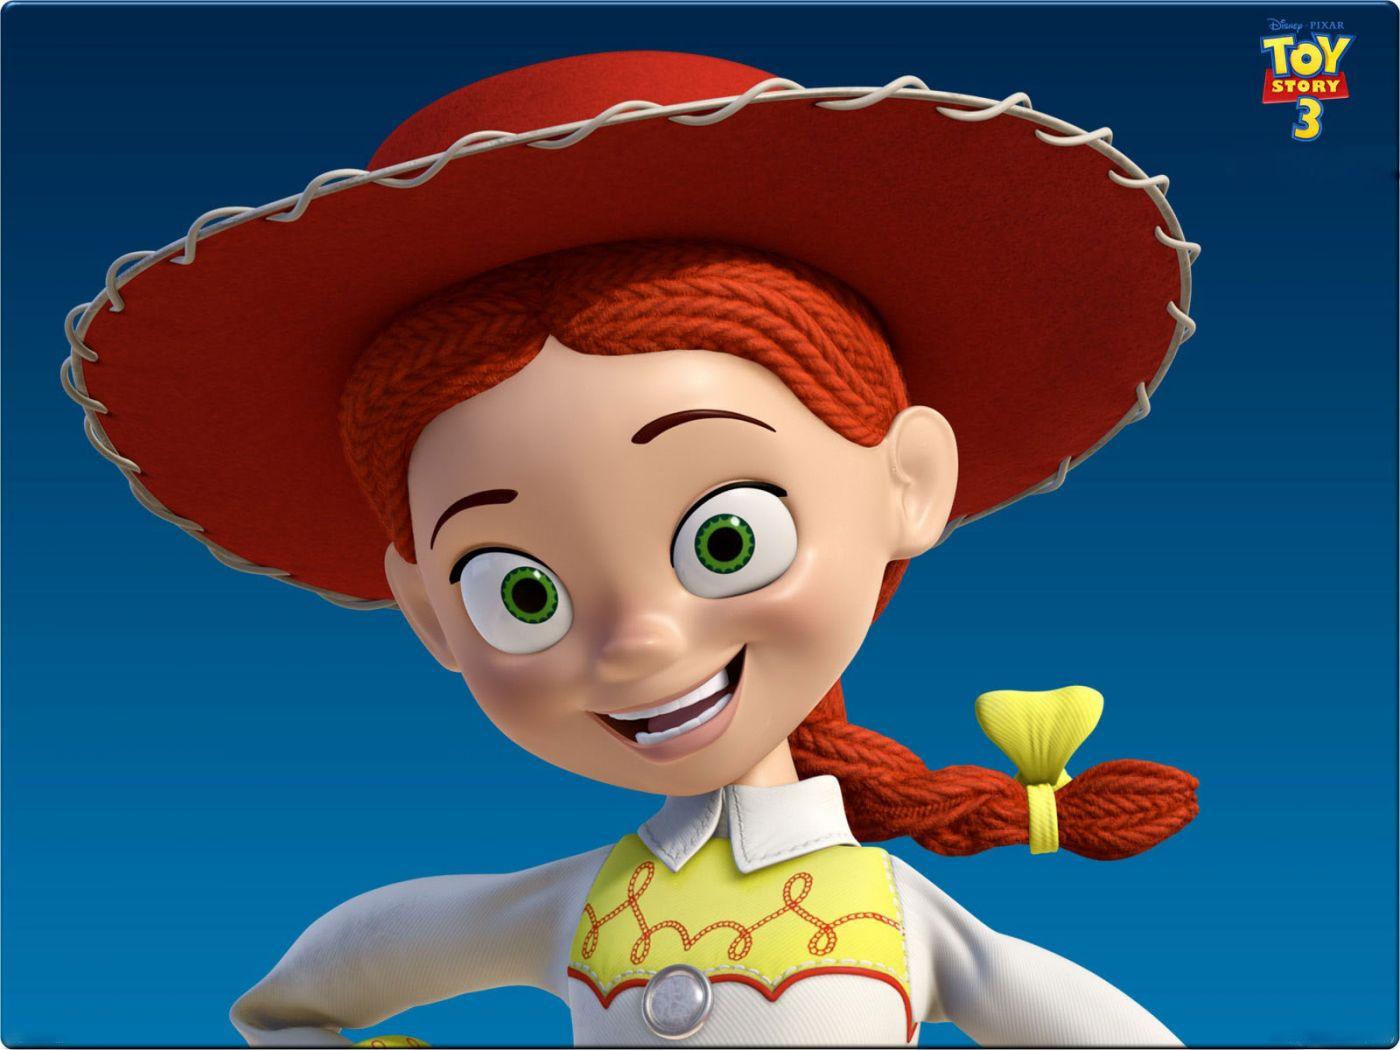 Jessie Headshot Toy Story 3 Wallpaper 14001050   Toy Story 1400x1050